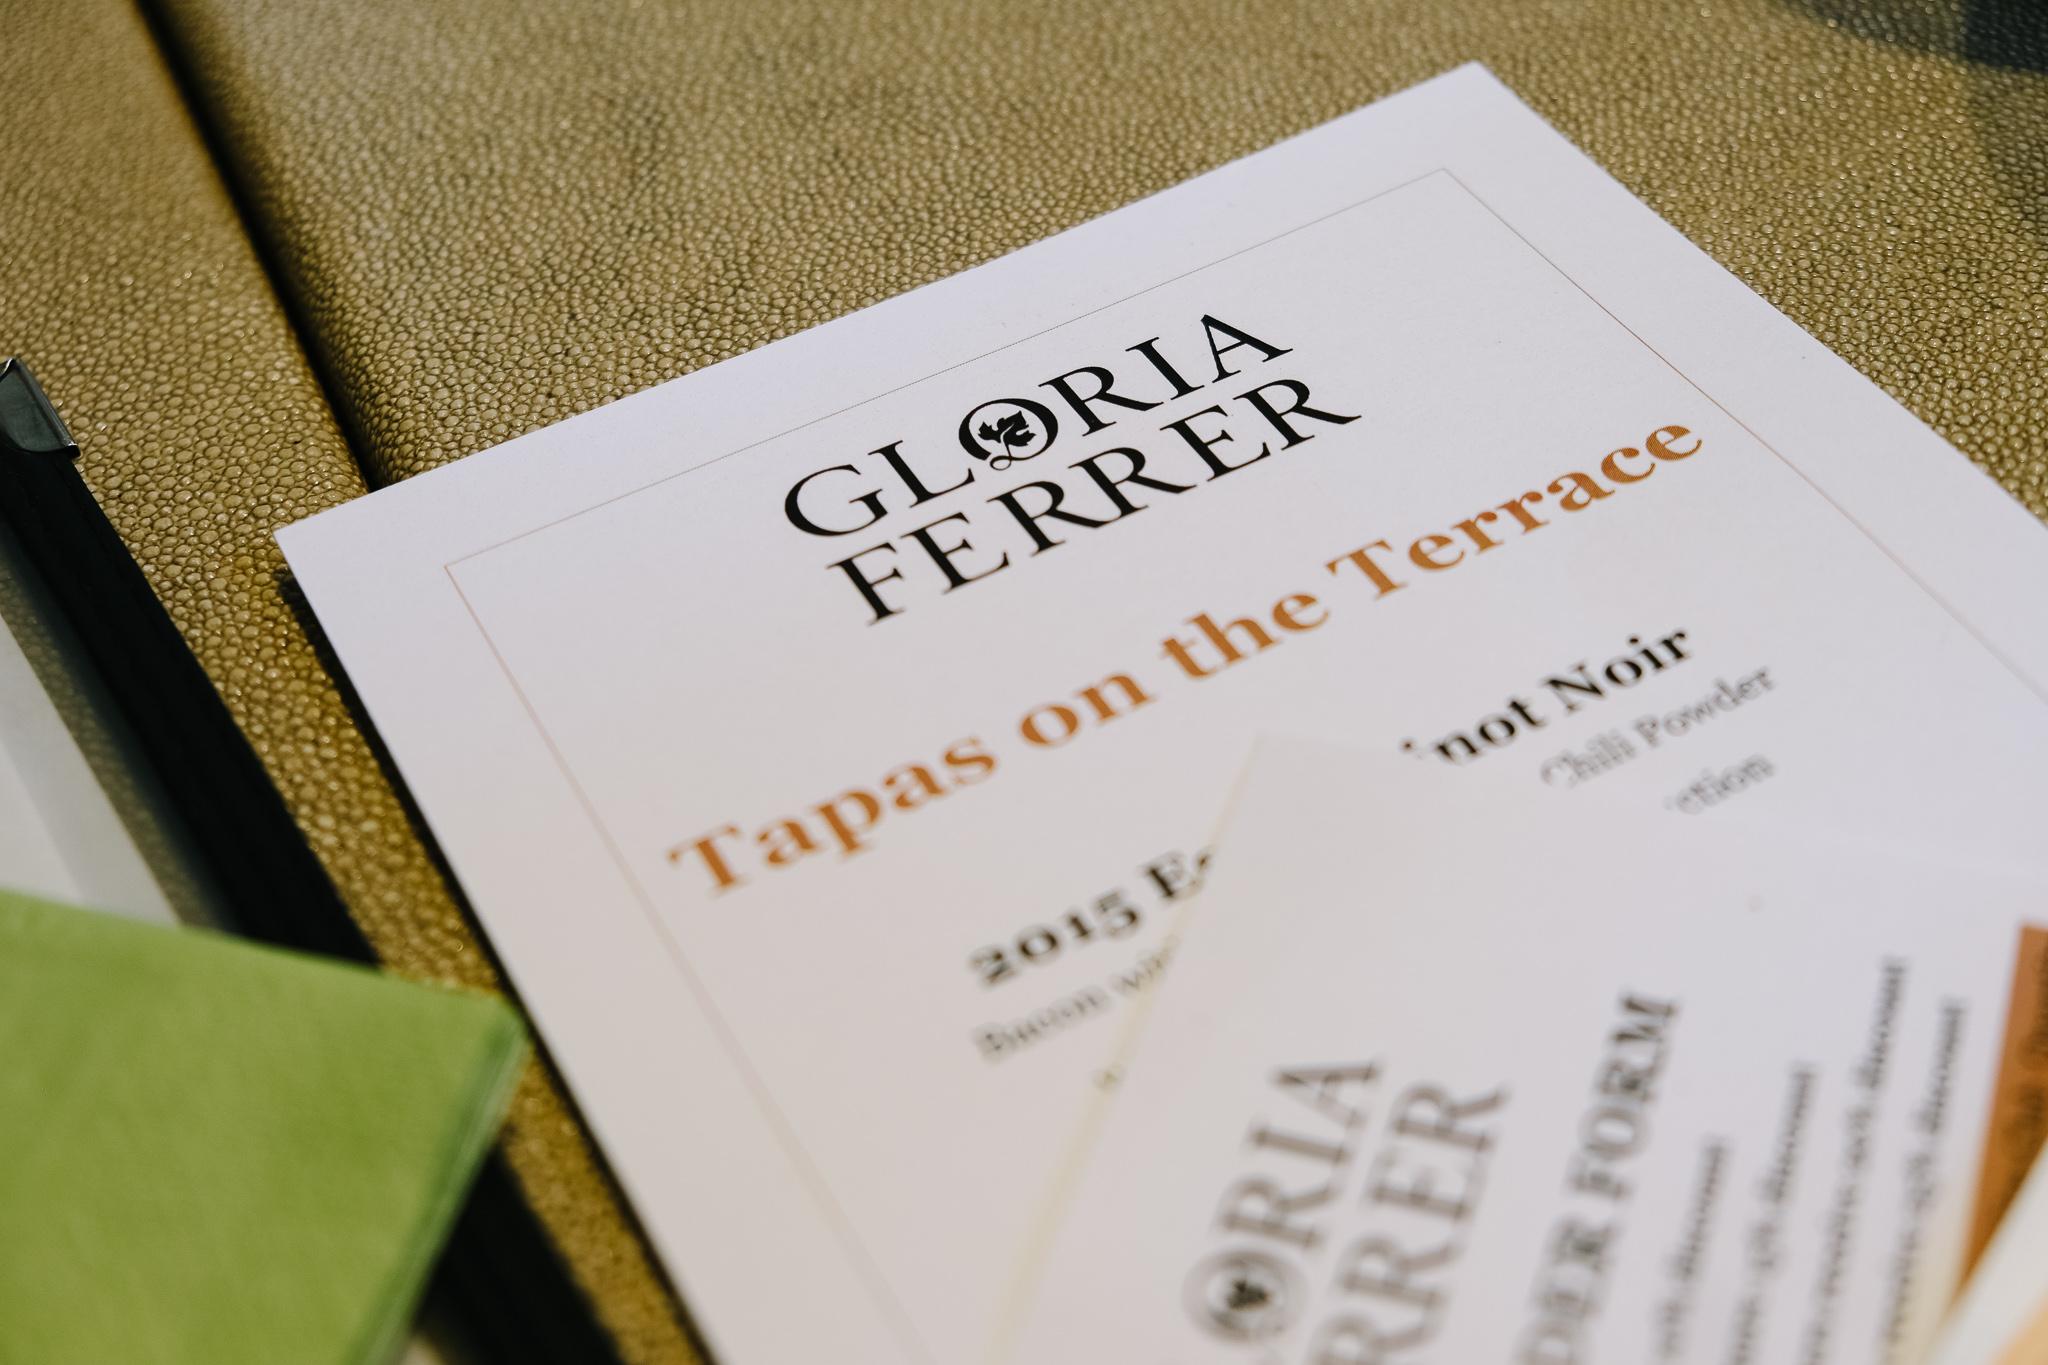 Gloria Ferrer Porch